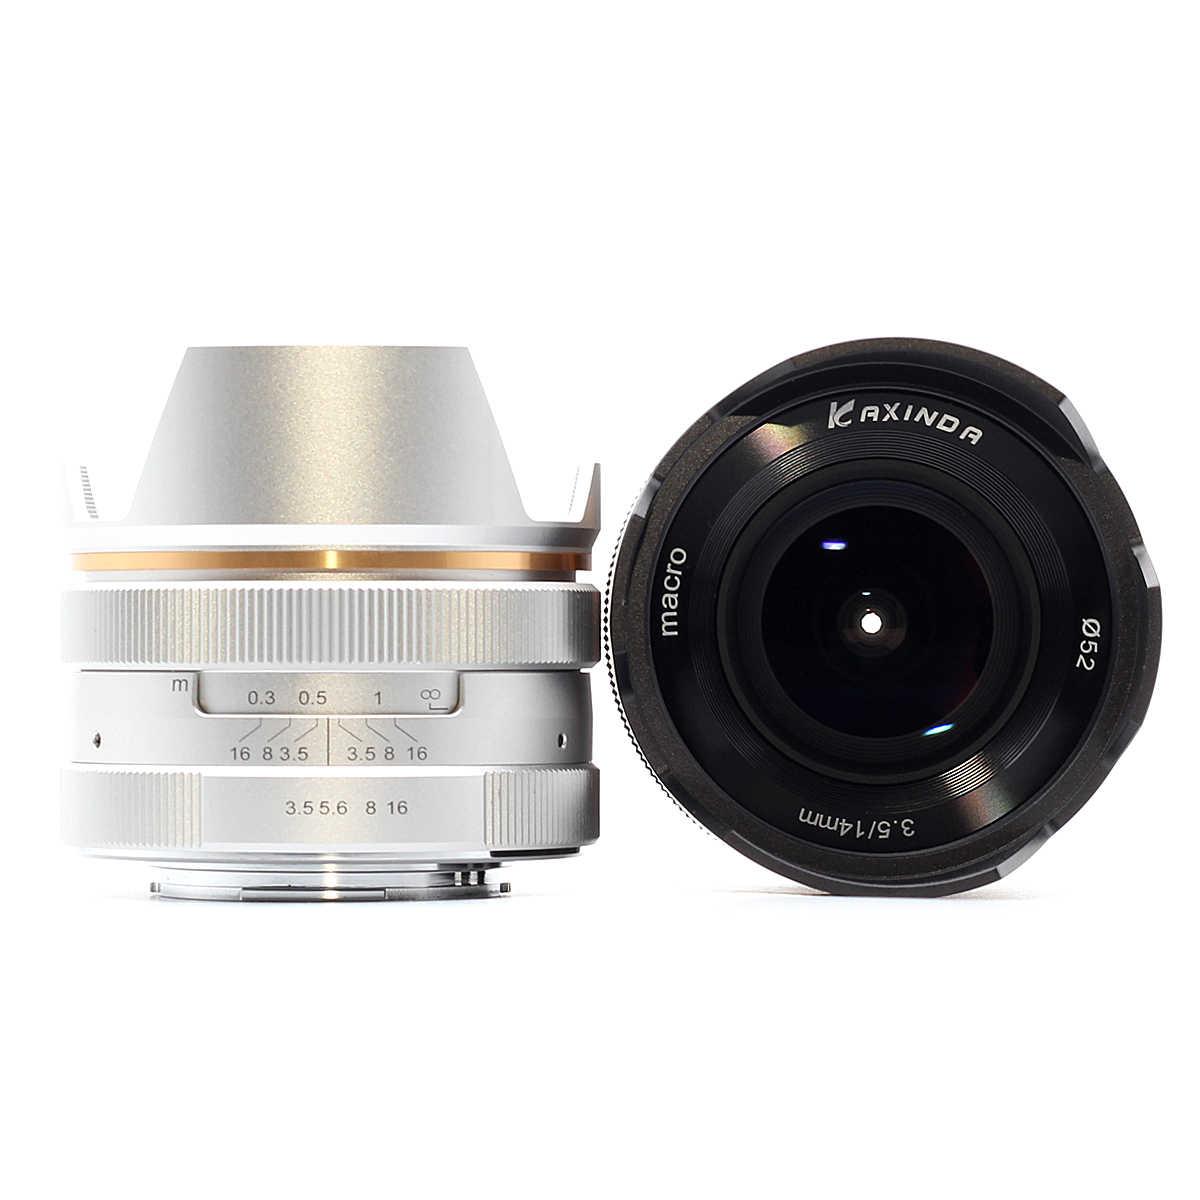 14 мм f/3,5 ручная правая объектив для Sony E Mount NEX Canon EF-M EOS M Fujifilm FX X Olympus Pansonic M43 MFT Micro4/3 14 мм F3.5